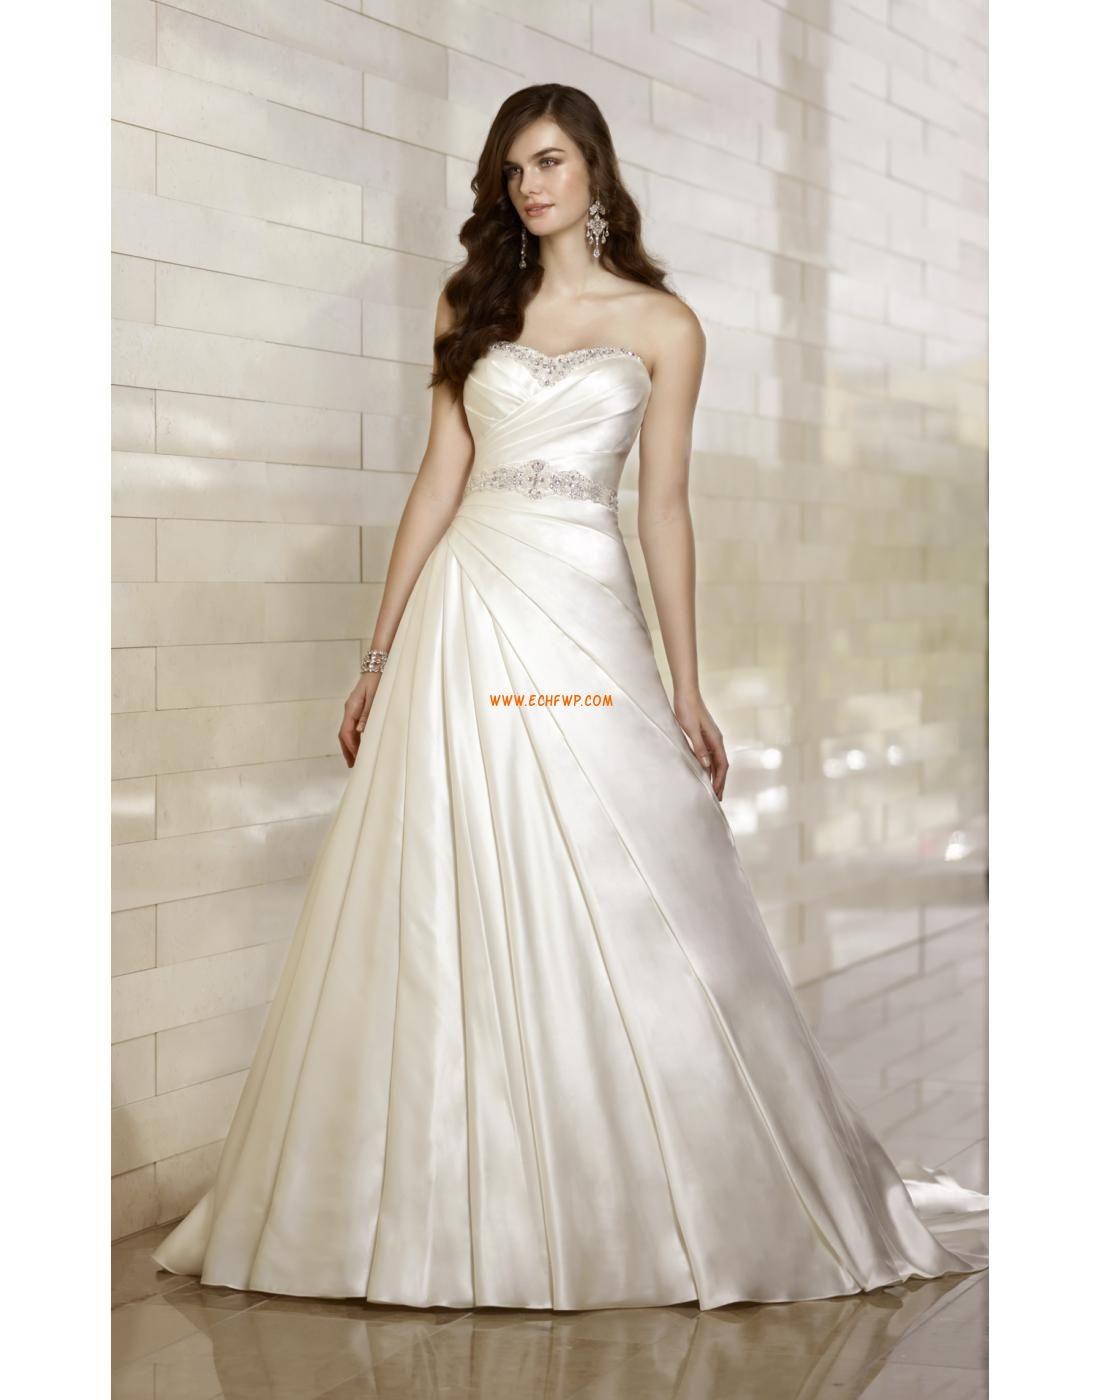 Church Court Train Sleeveless Wedding Dresses 2014   Accessories ...